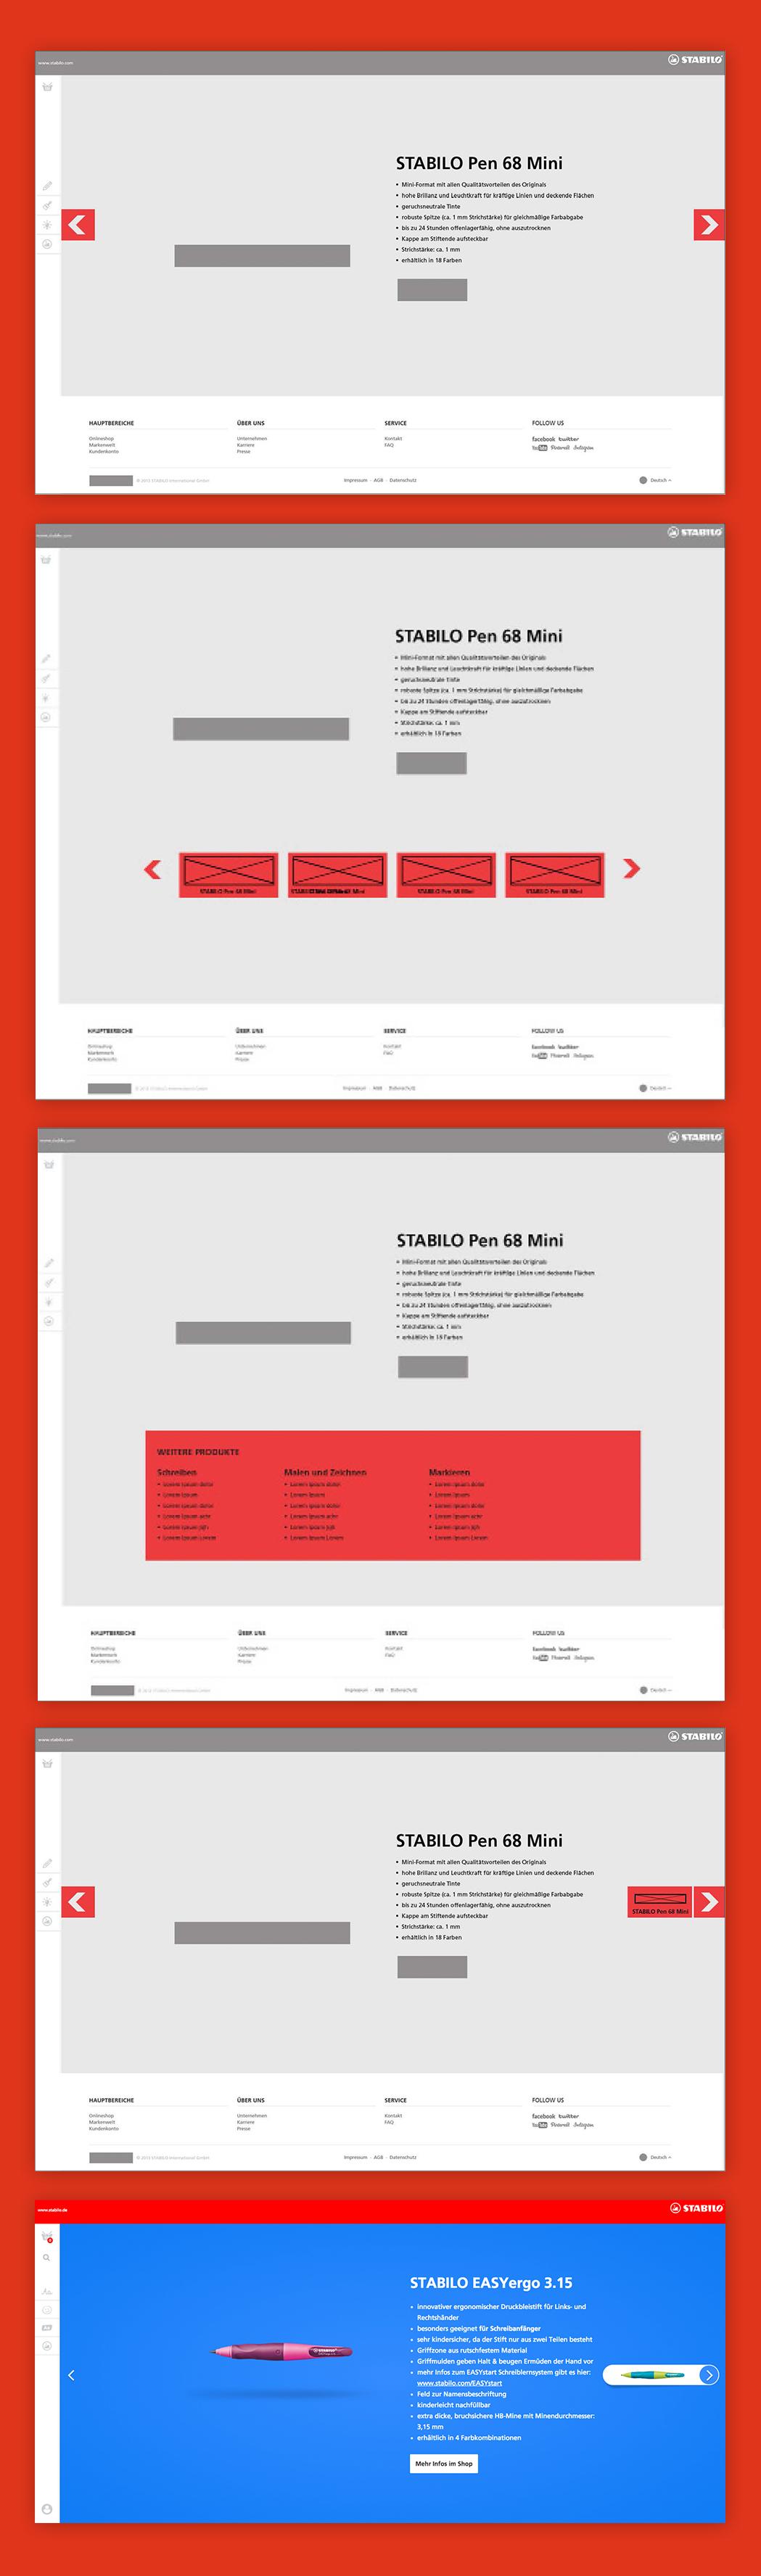 MaritaHeinzelmann_UX_UI_Design_Usability_Stabilo_Produktwechsel